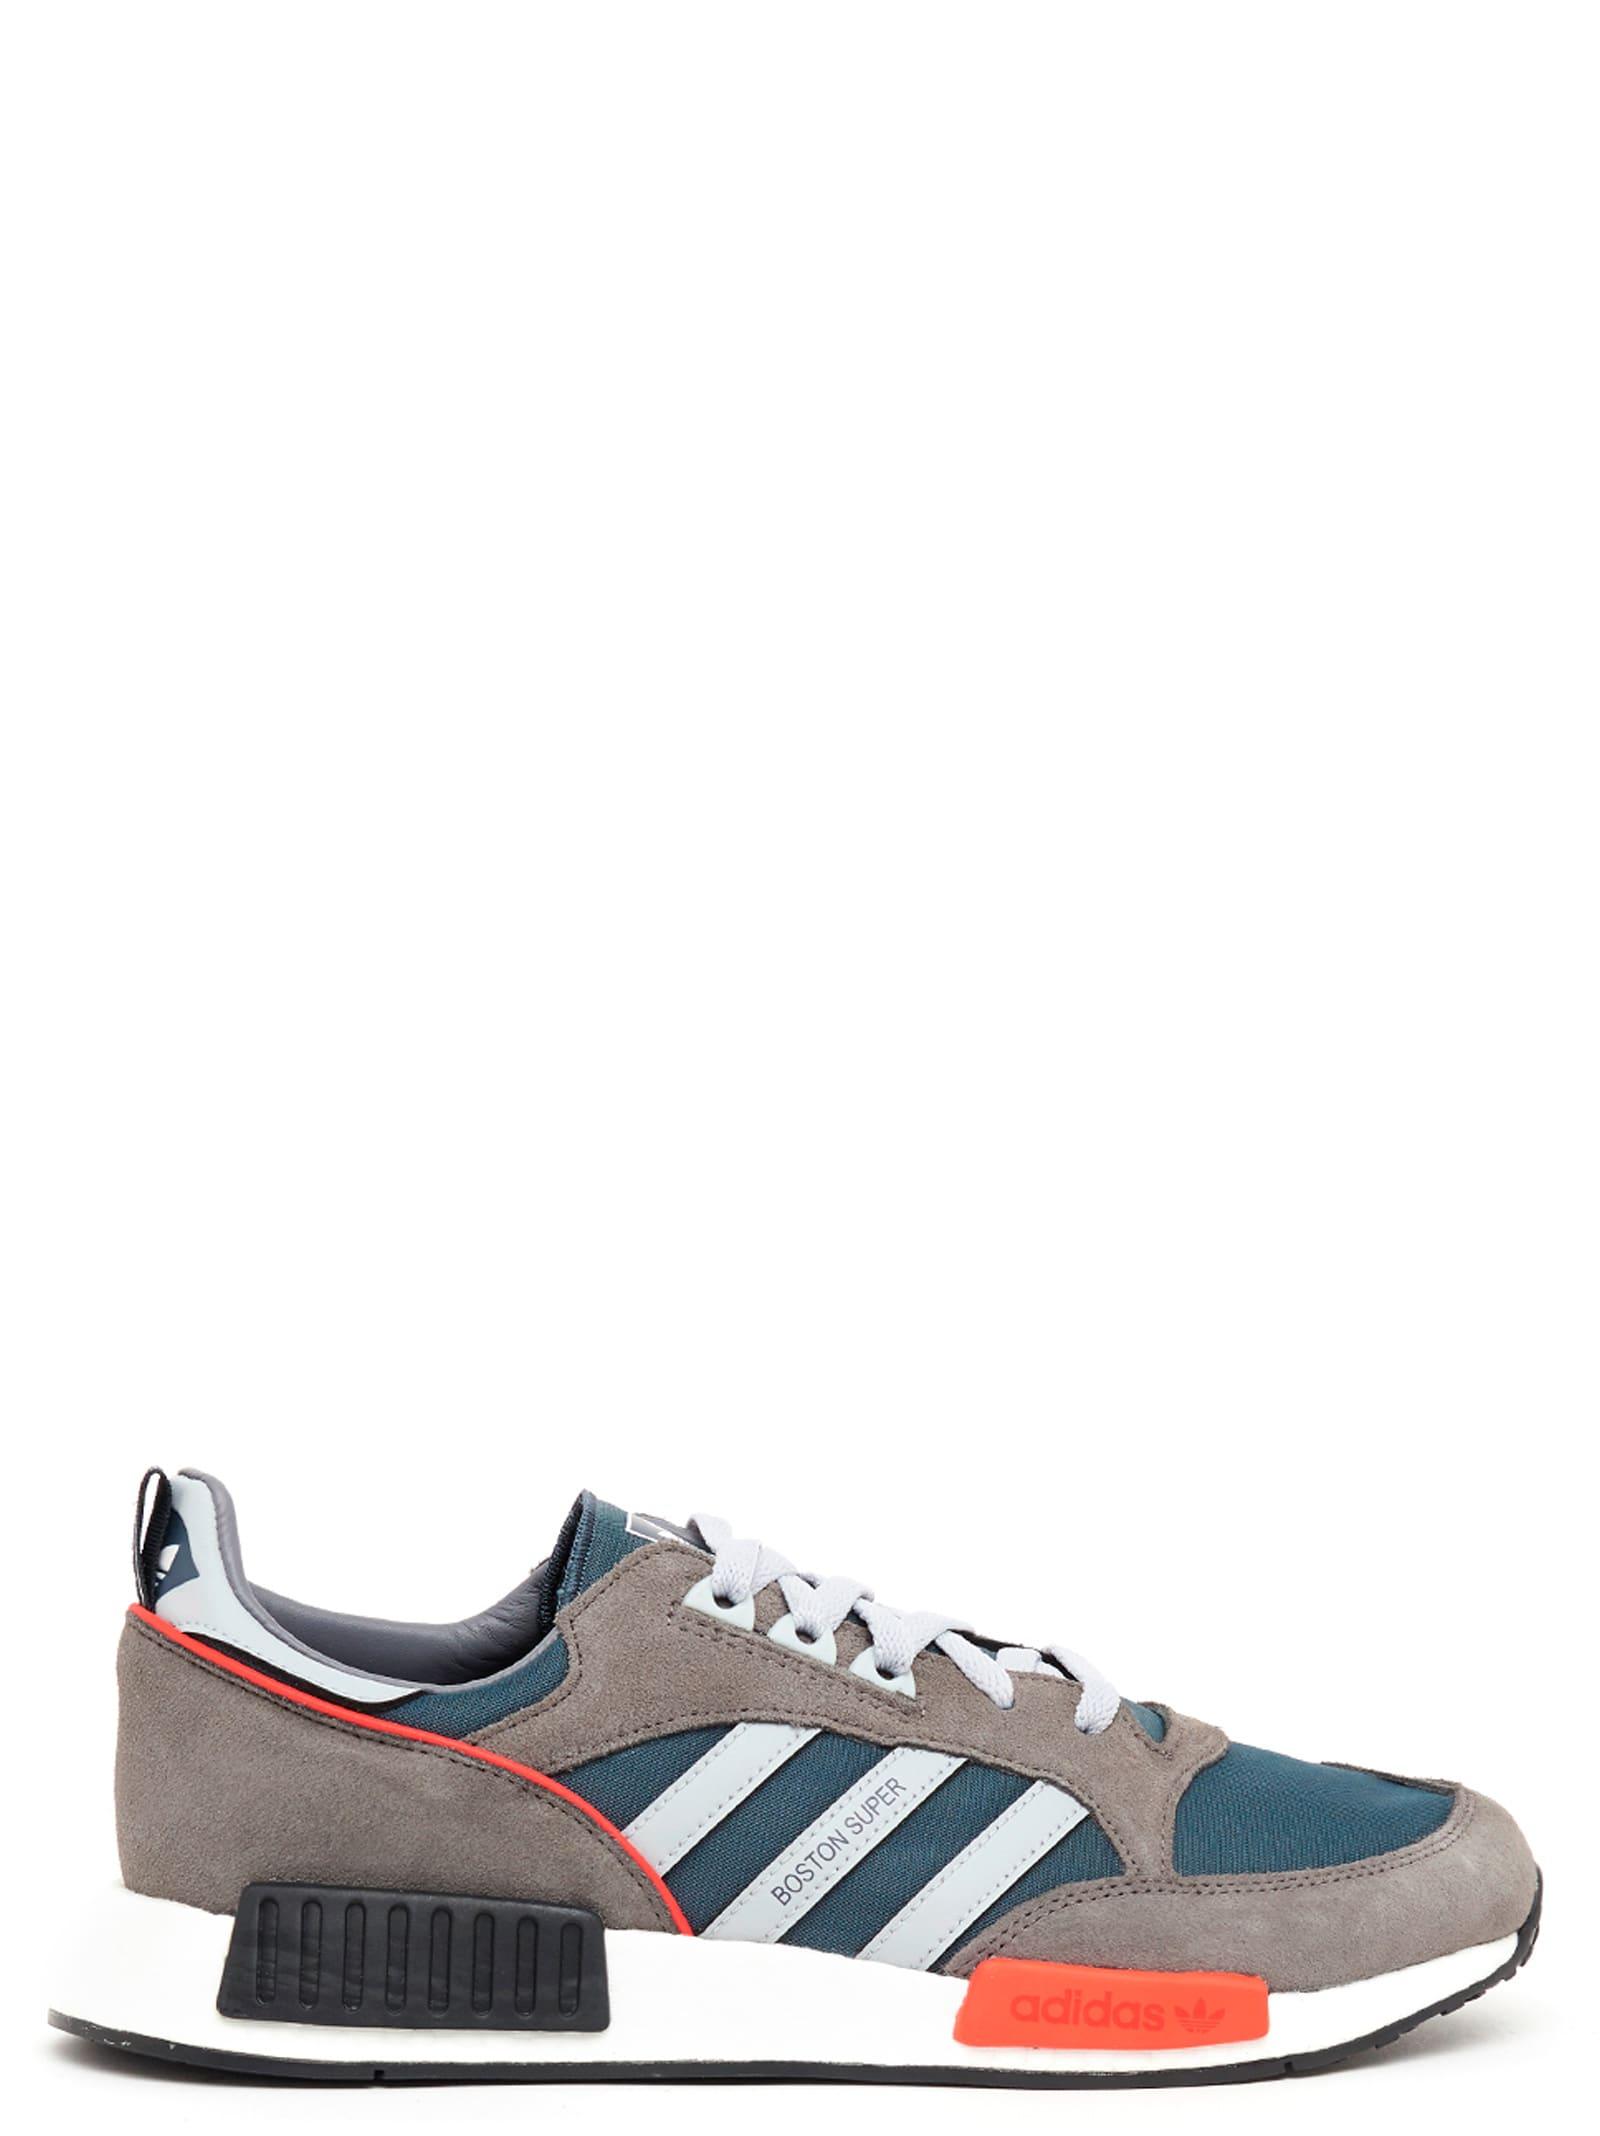 the latest d7eff bc5eb Best price on the market at italist | Adidas Originals Adidas Originals  'boston Super X R1' Shoes